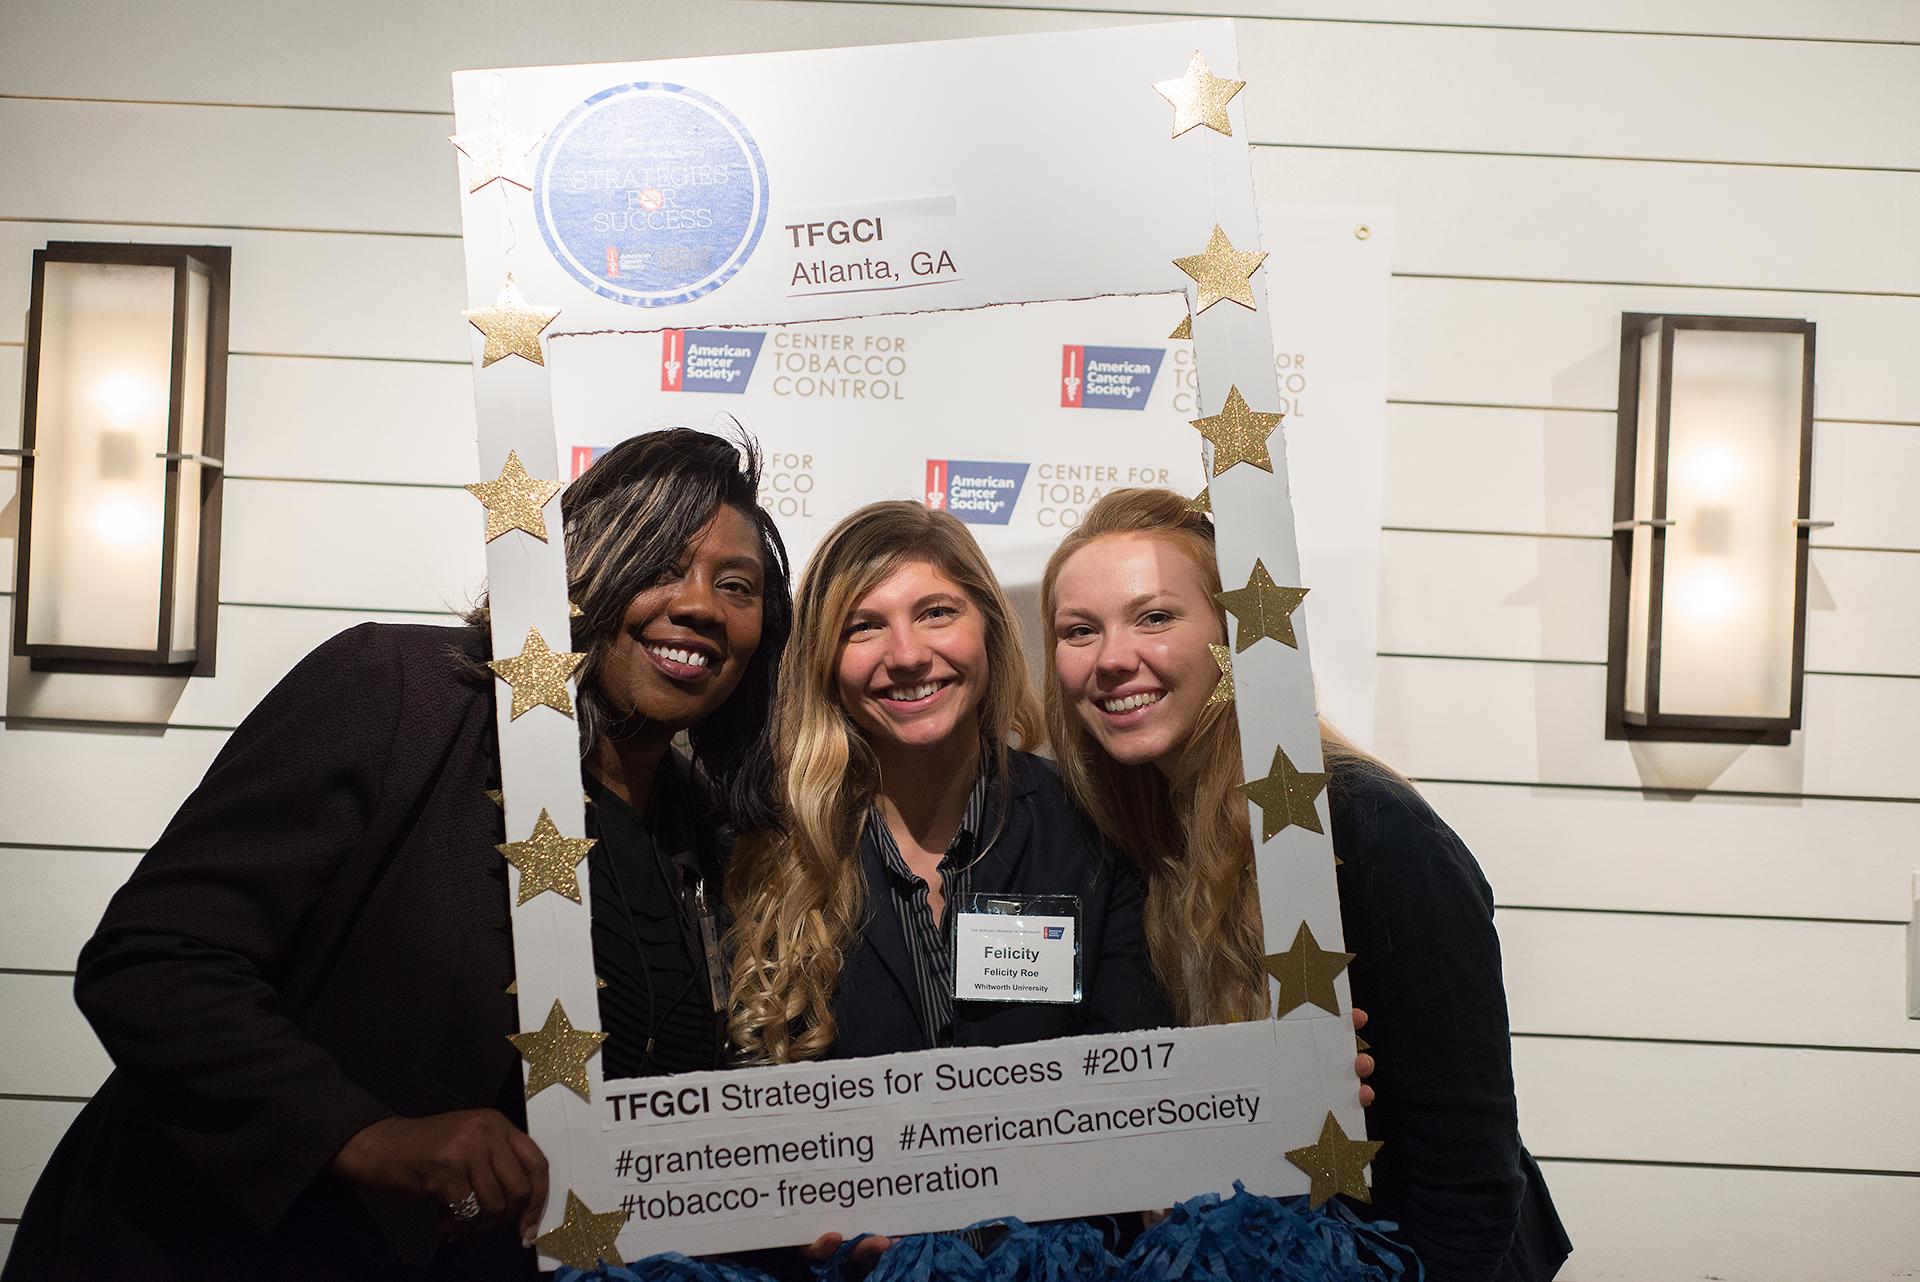 TFGCI Annual Grantee Meeting - Ann Arbor - Photobooth